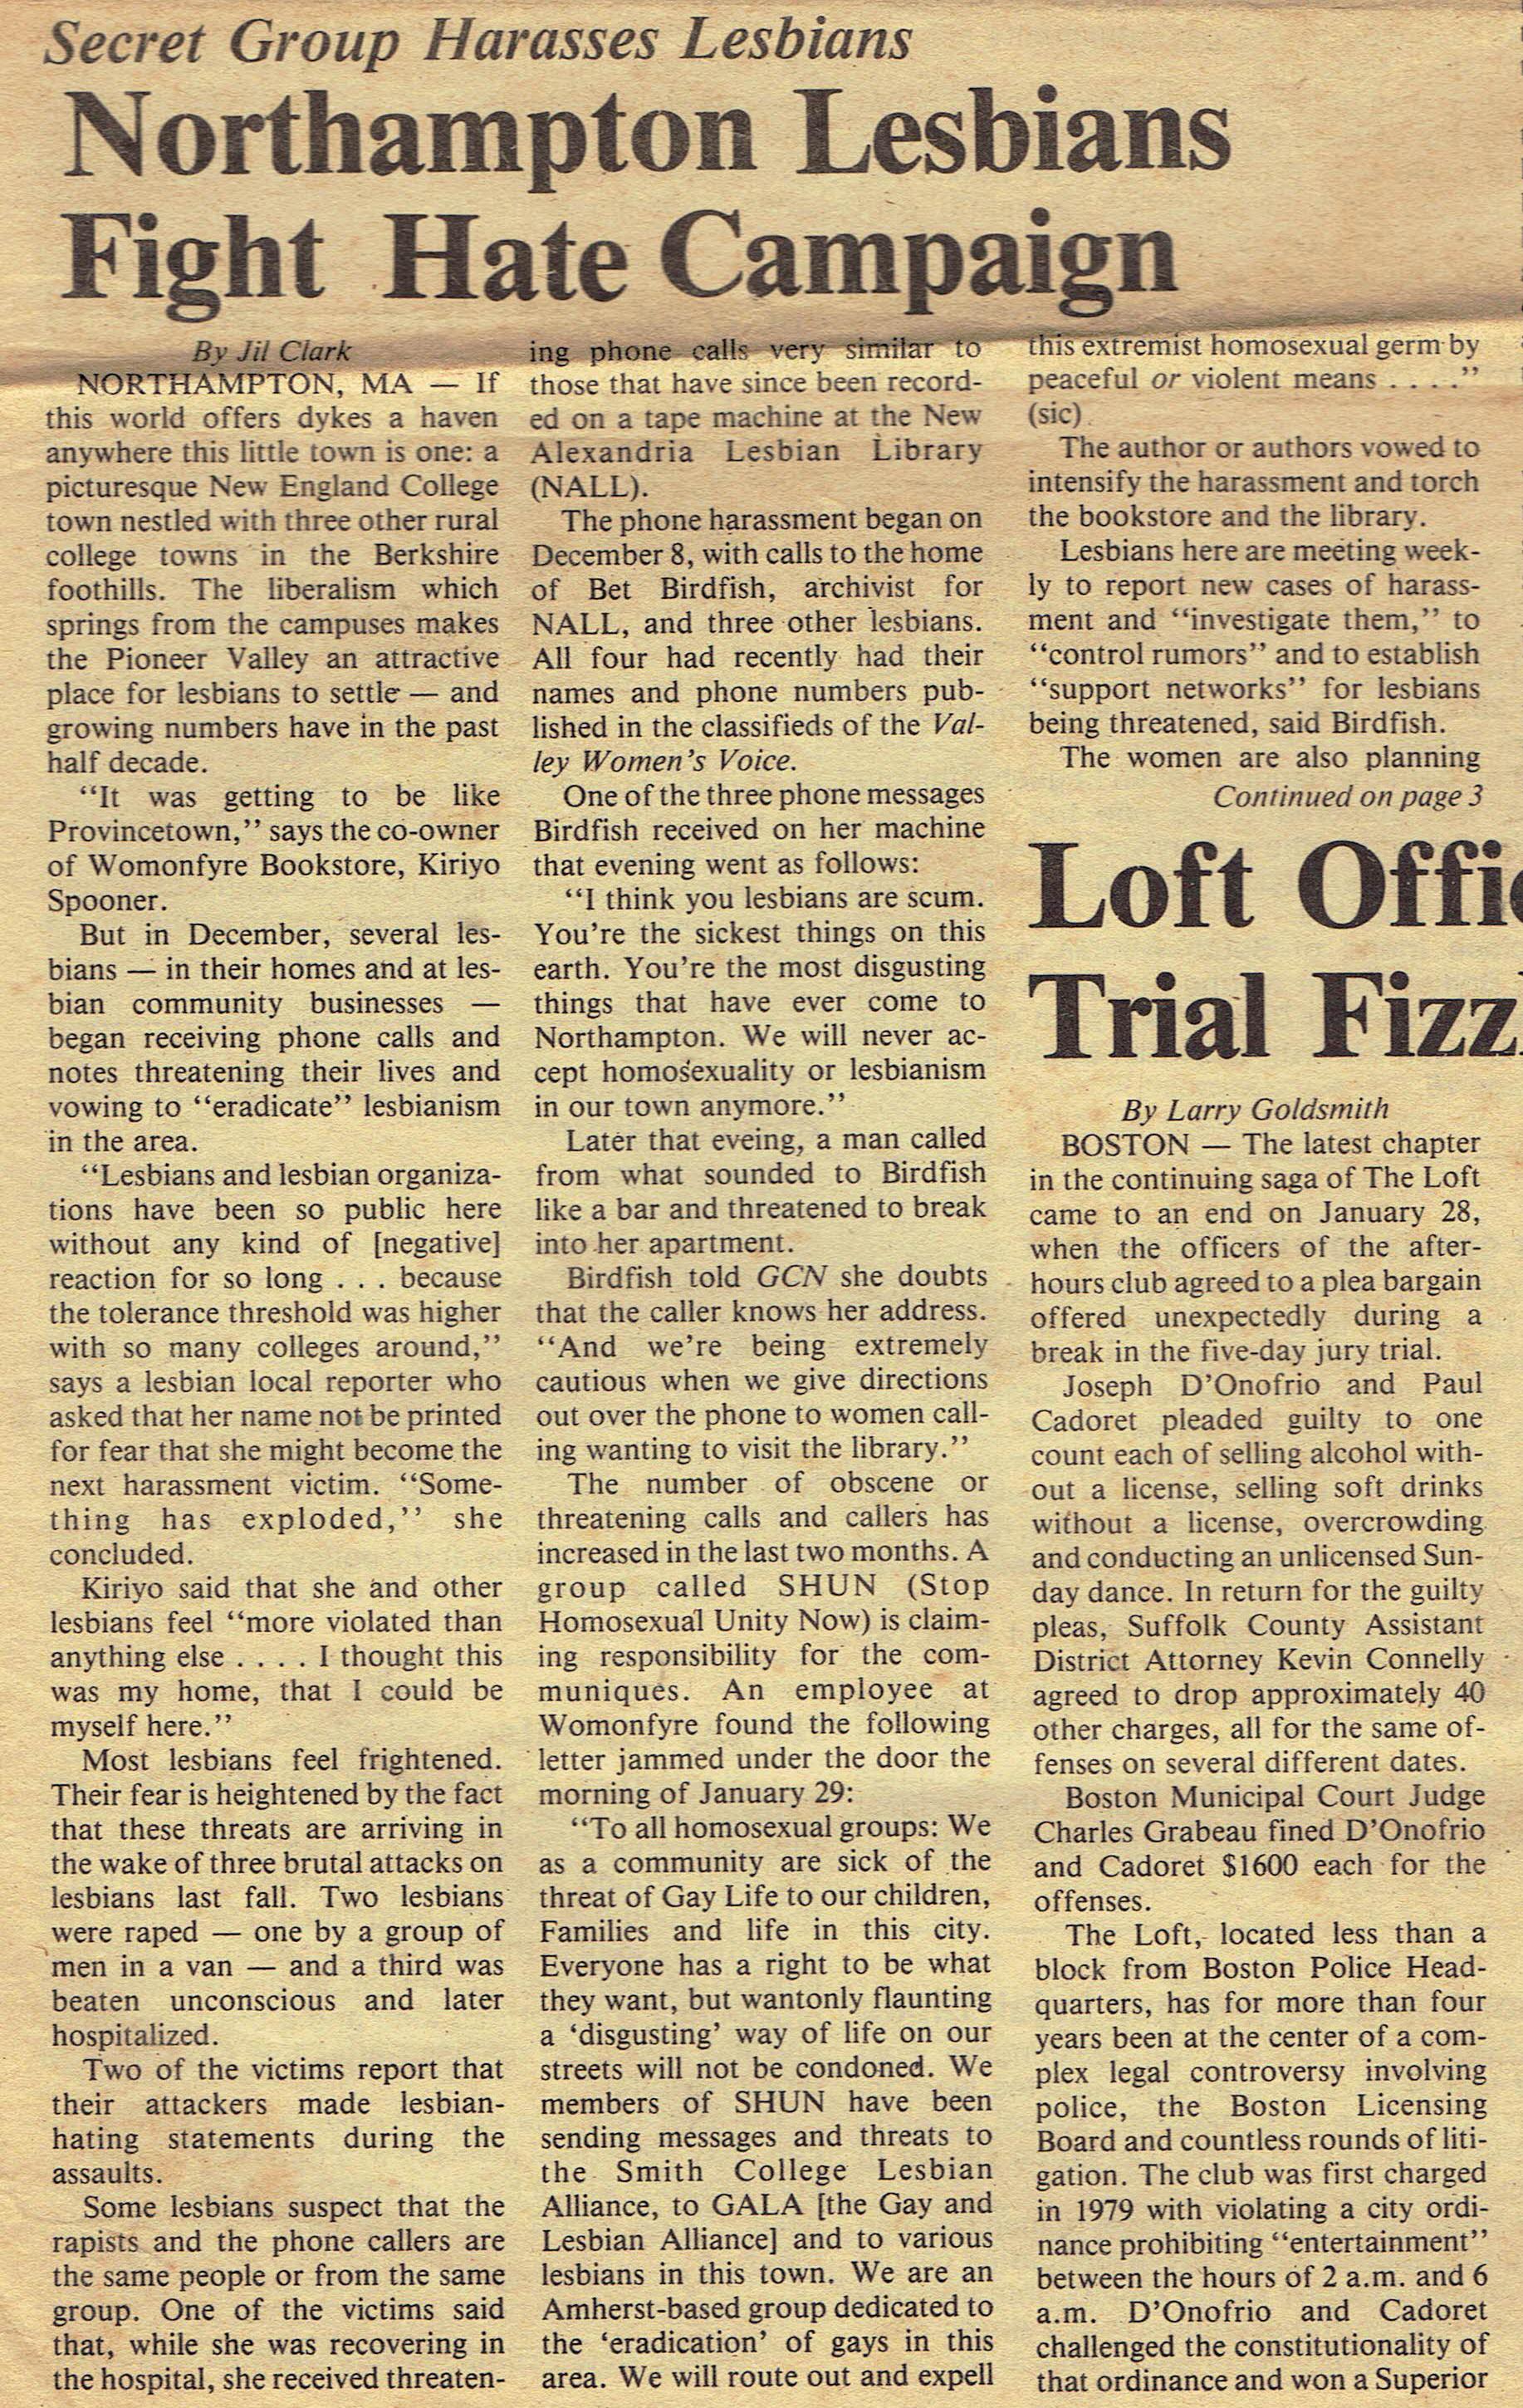 . Gay Community News. Boston, MA. Feb. 12, 1983.